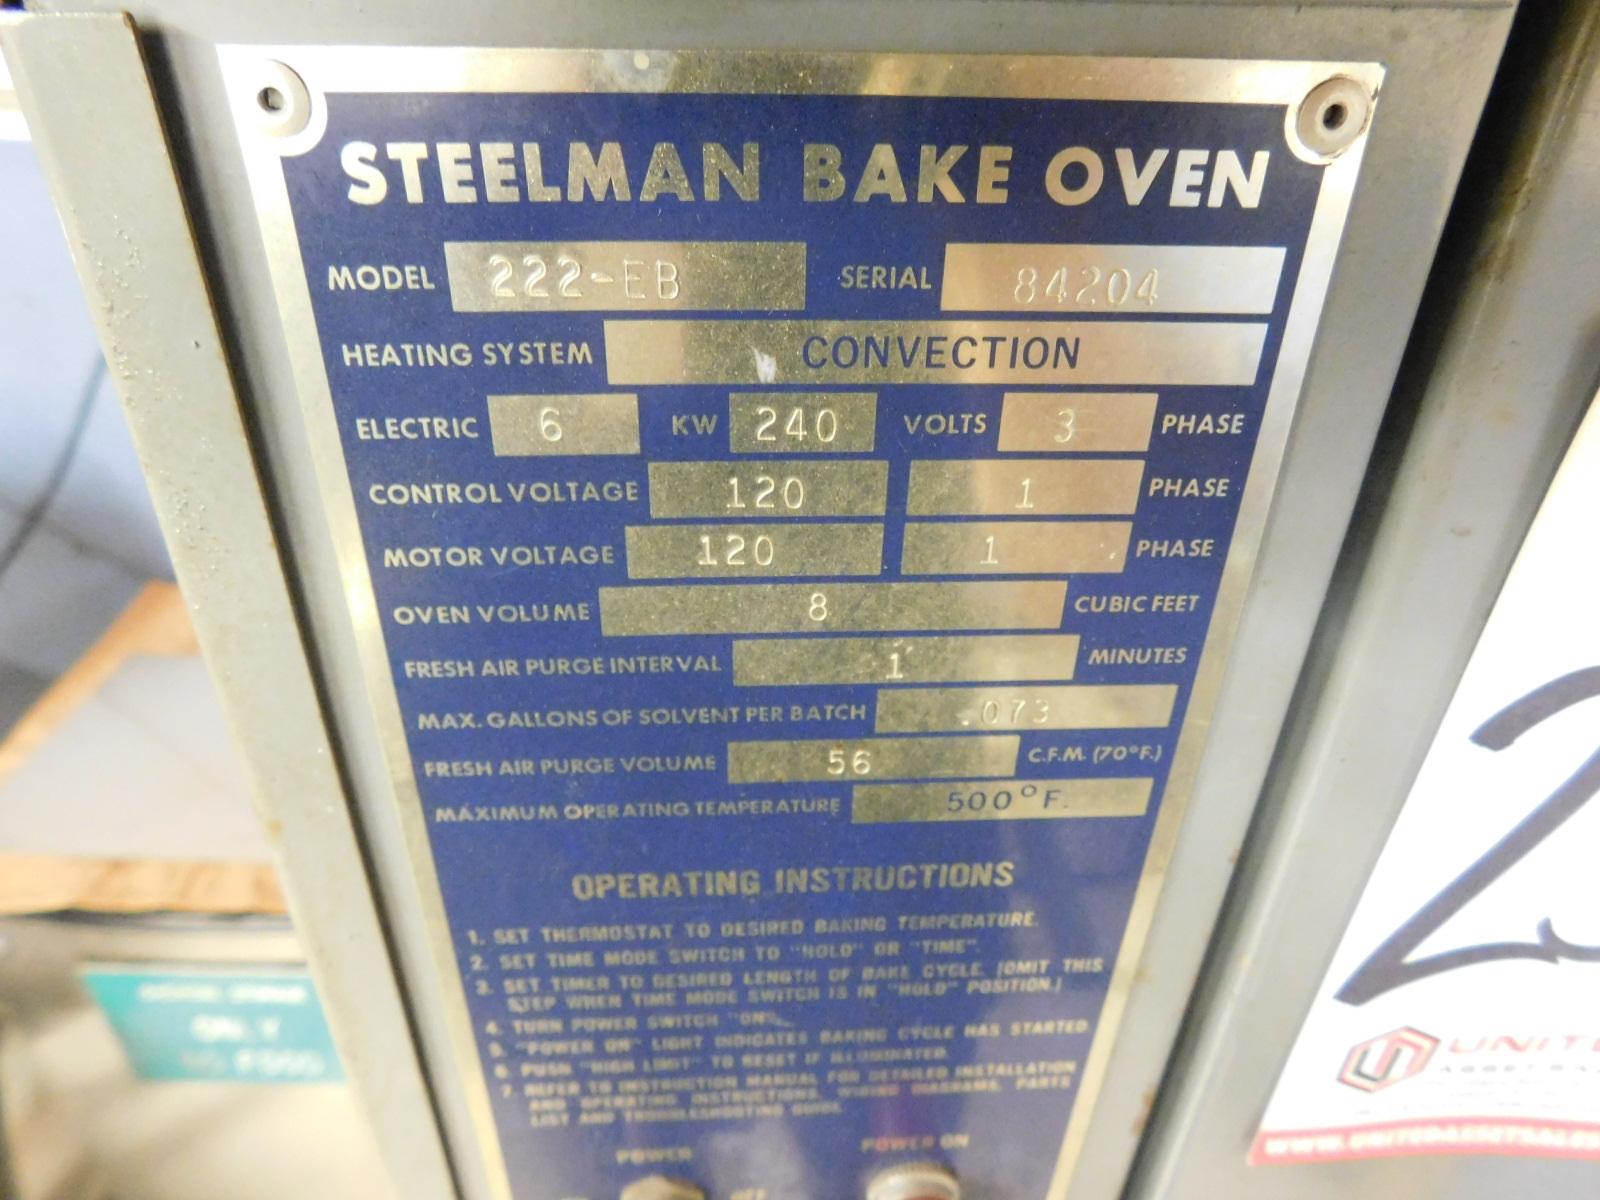 Lot 25 - STEELMAN BAKE OVEN, MODEL 222-EB, ELECTRIC, 500°F, S/N 84204